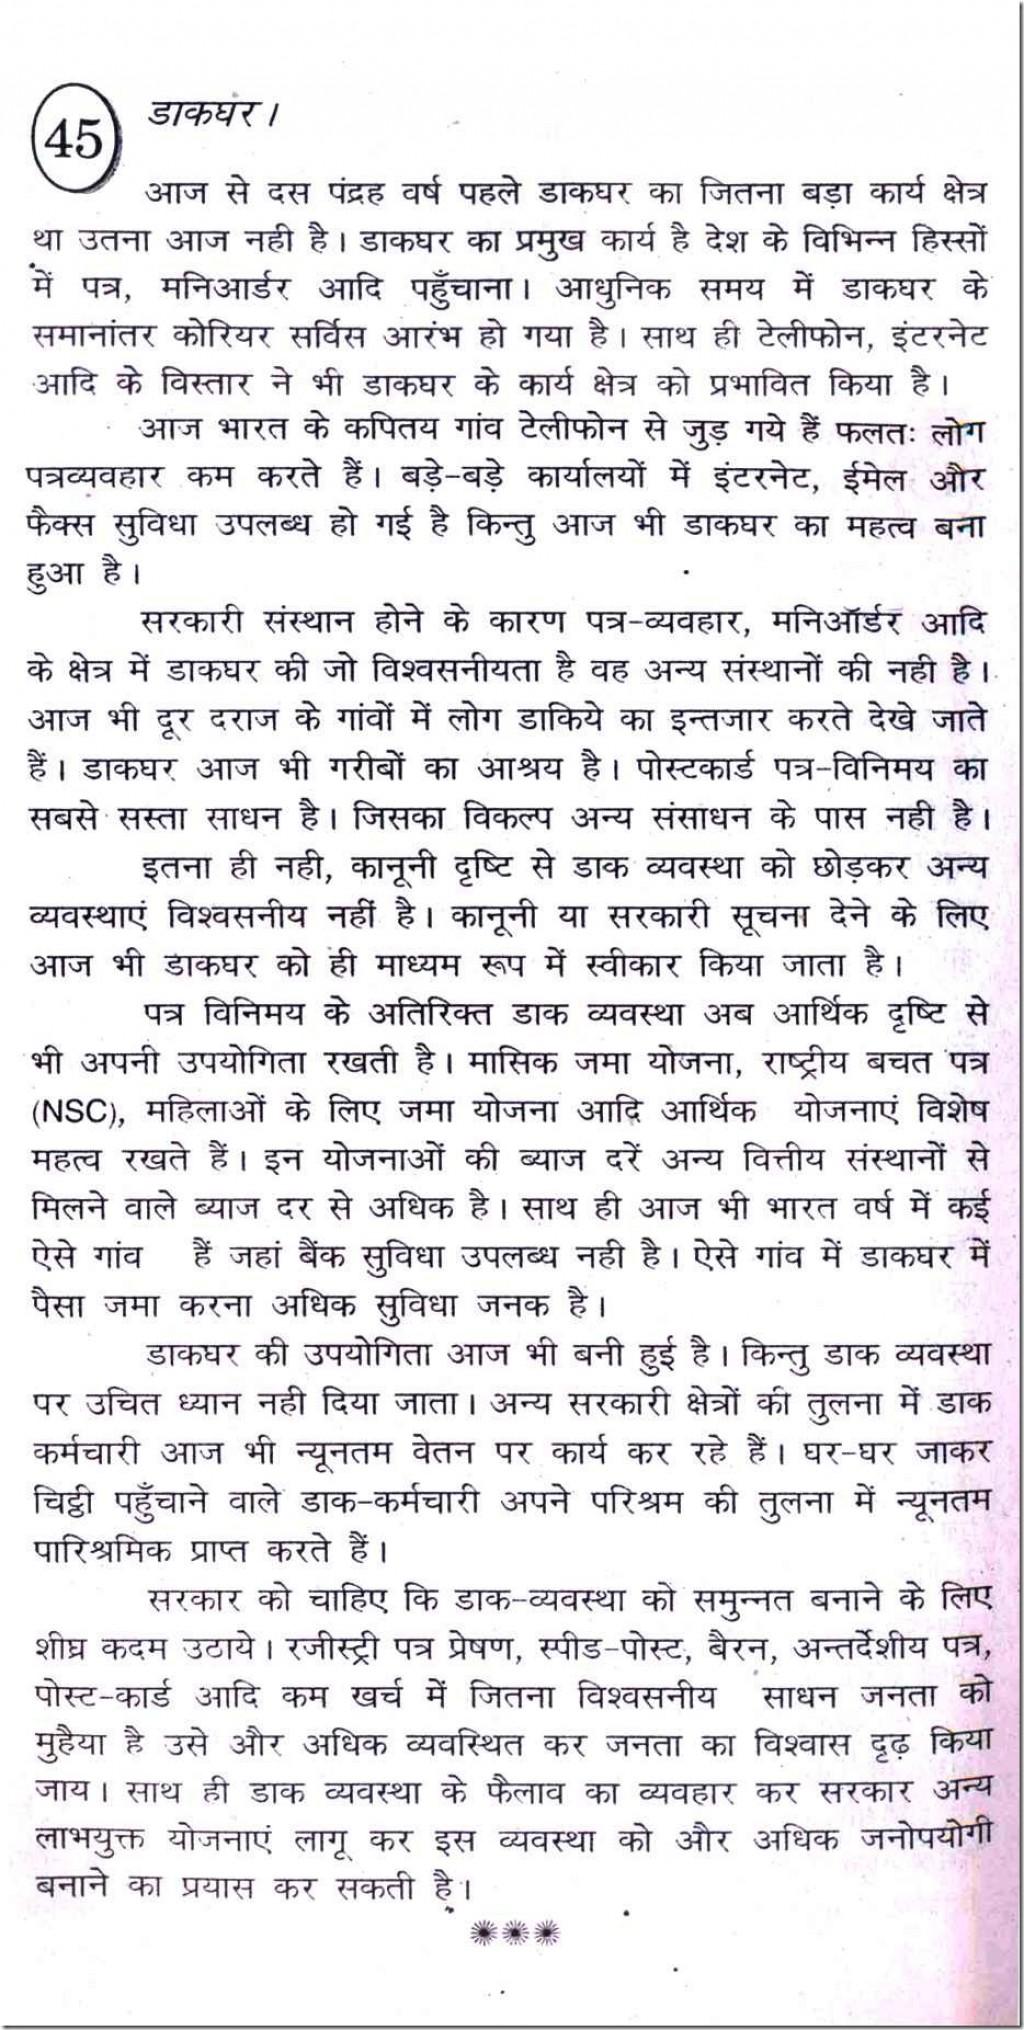 018 Hard Work Essay Example Wonderful Pdf Pays Off In Hindi Writing Large